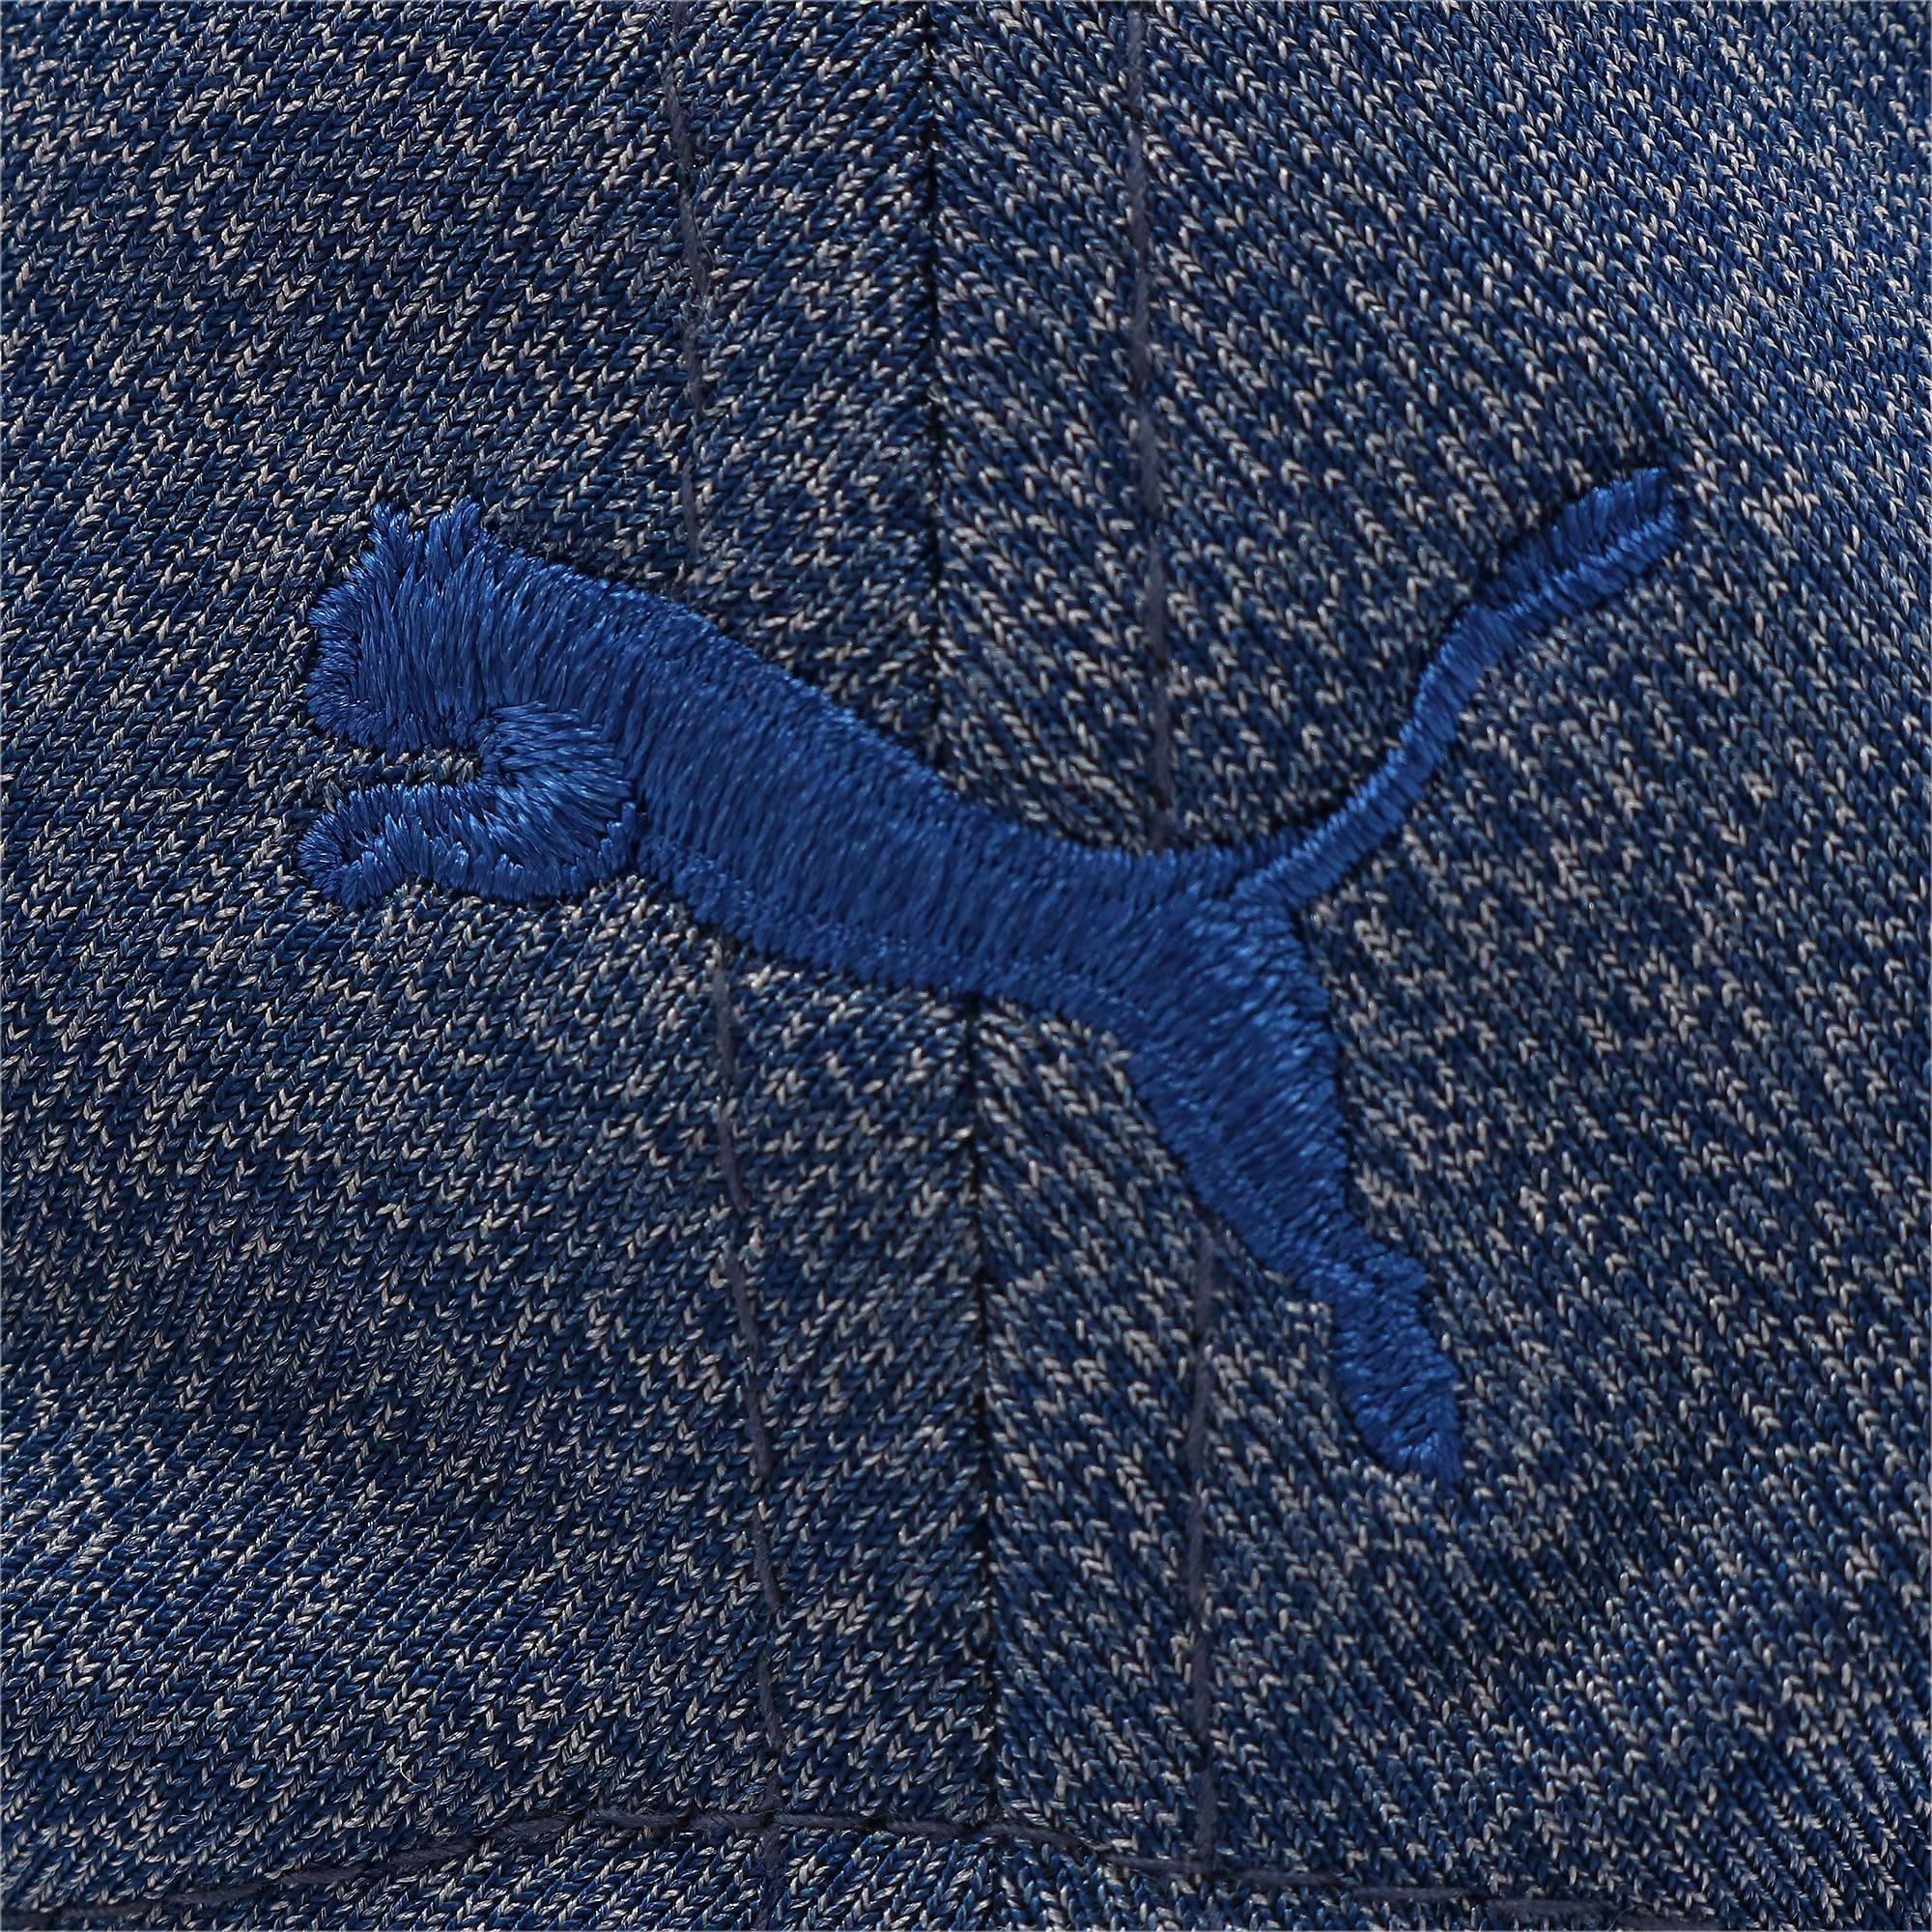 Thumbnail 3 of ゴルフ Pマークスナップバックキャップ, Peacoat-Dazzling Blue, medium-JPN